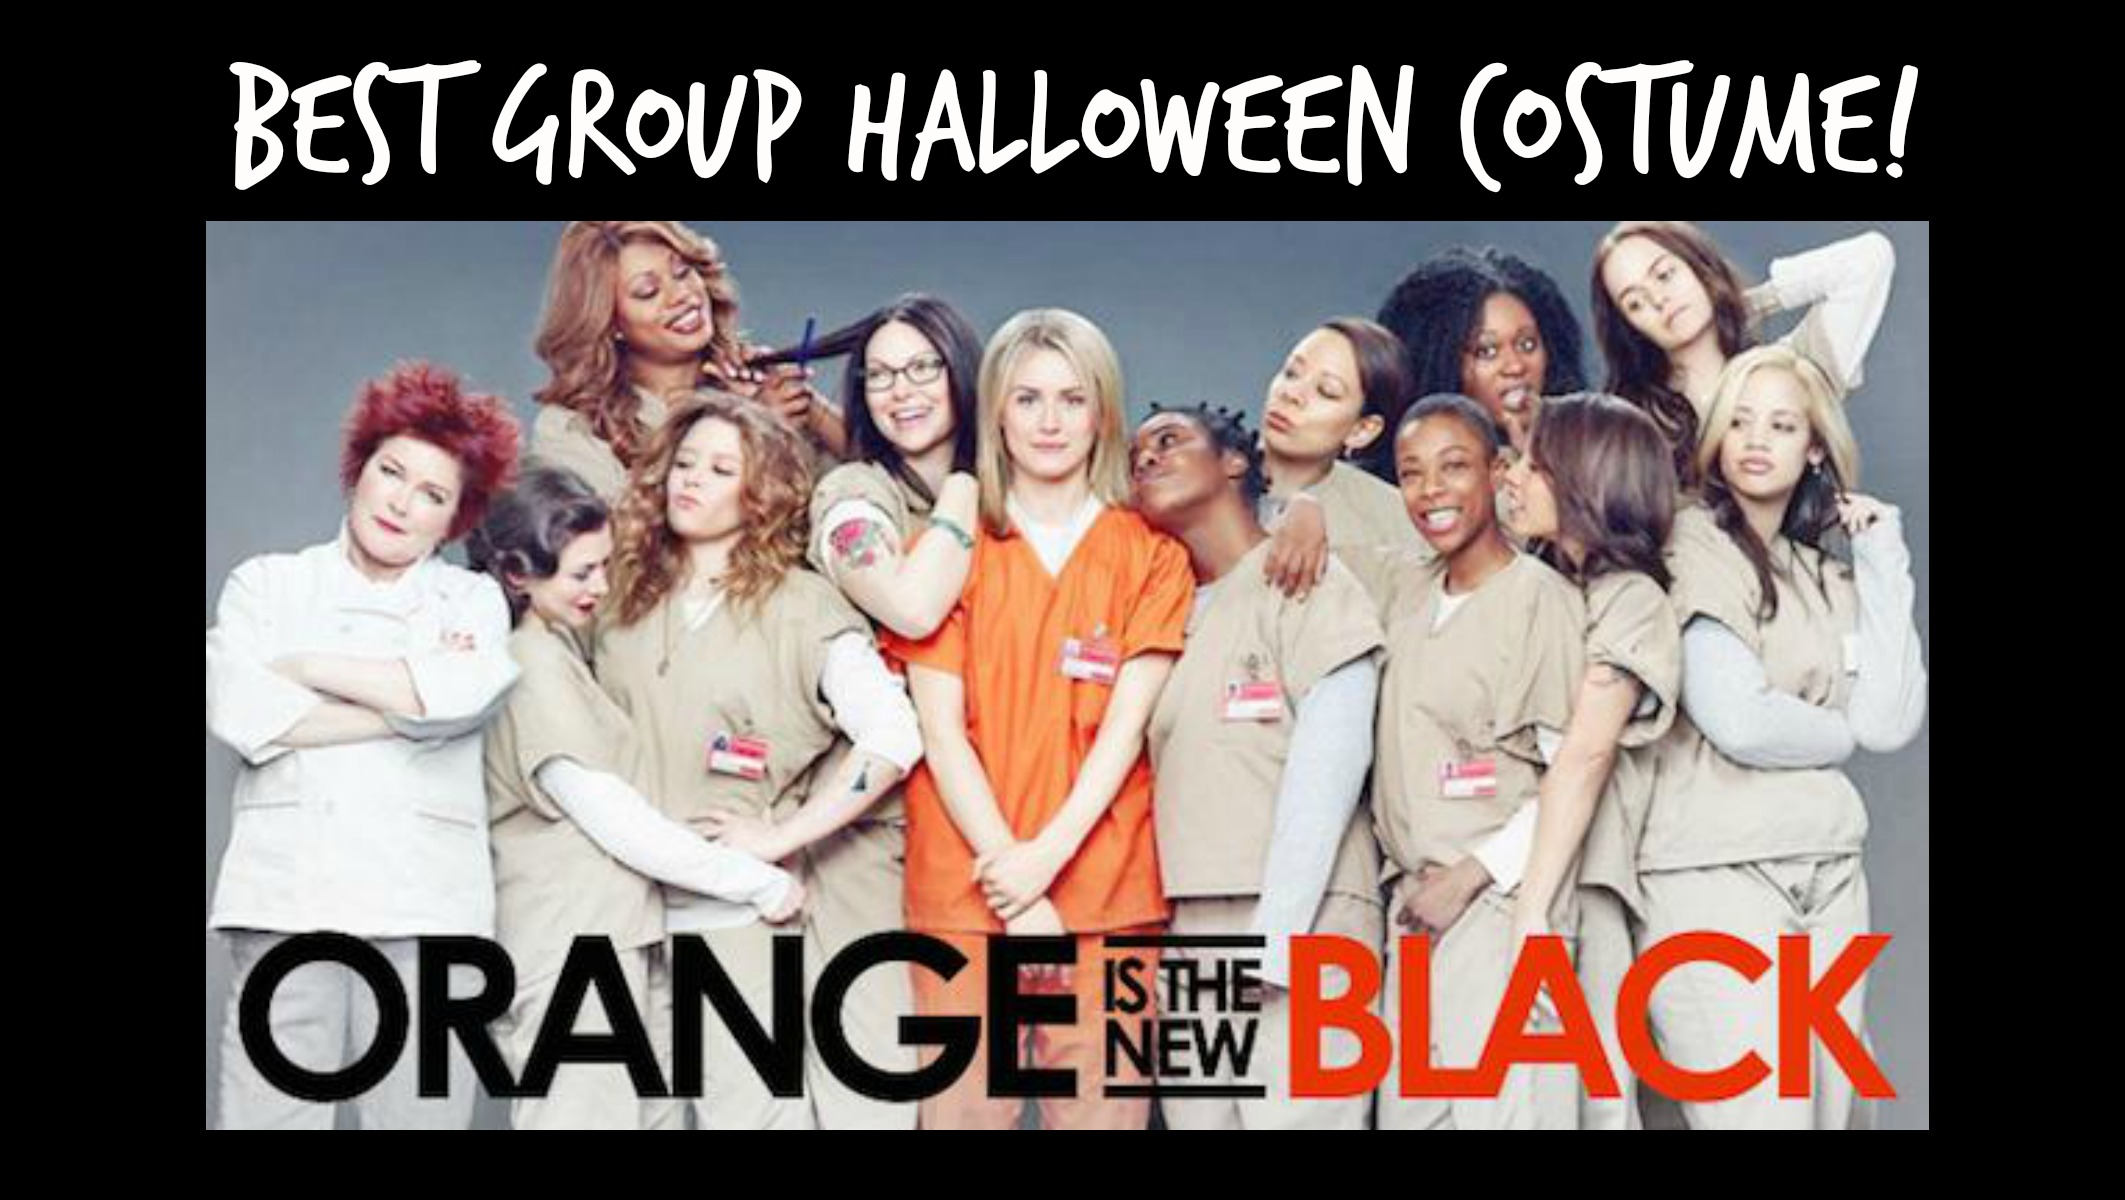 Best Group Halloween Costume Orange is the New Black